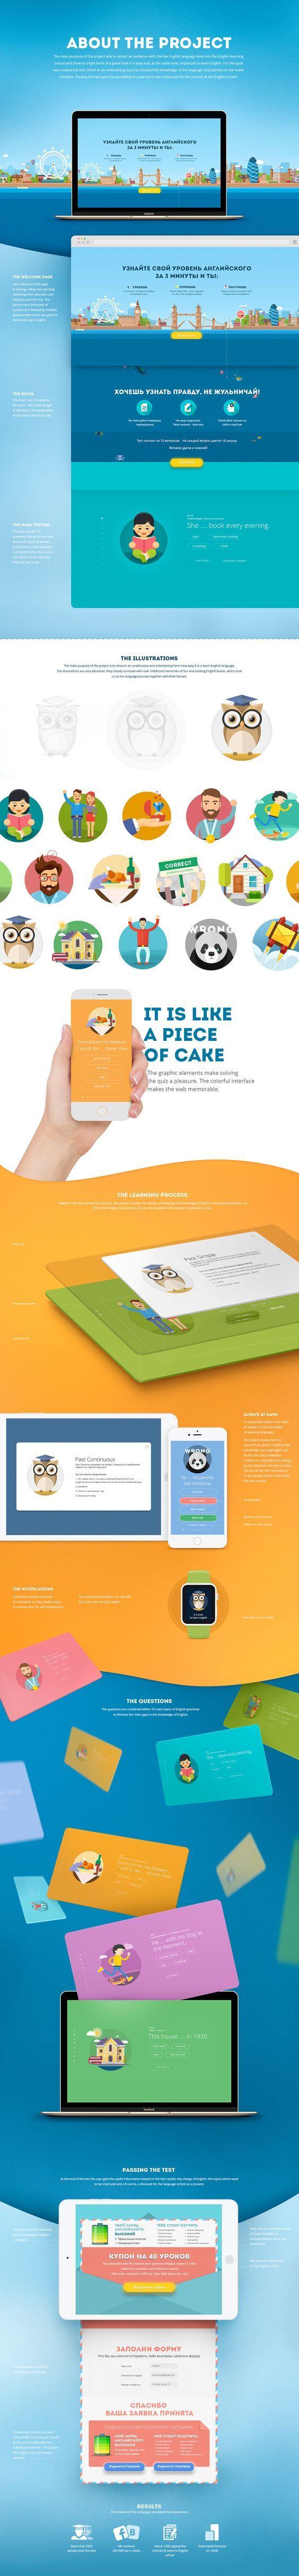 Master english | Marketing case on Web Design Served: